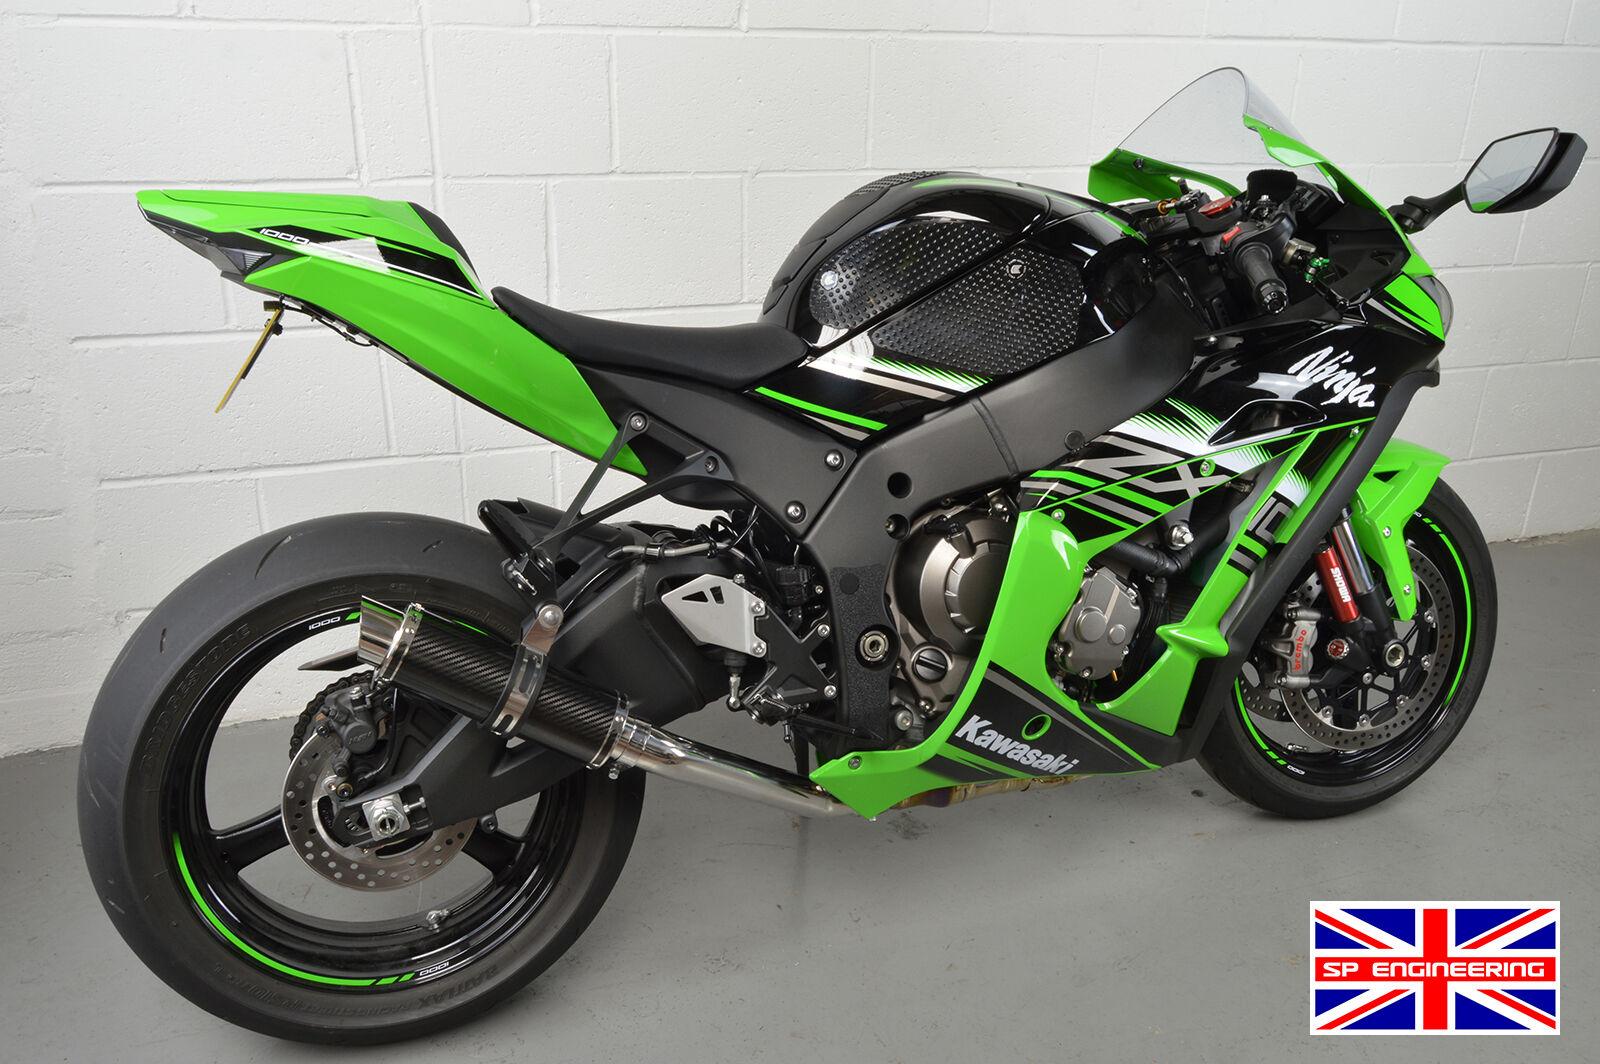 Kawasaki ZX9R Exhaust 94-97 B SP Engineering Carbon Fibre Round Stubby Moto GP